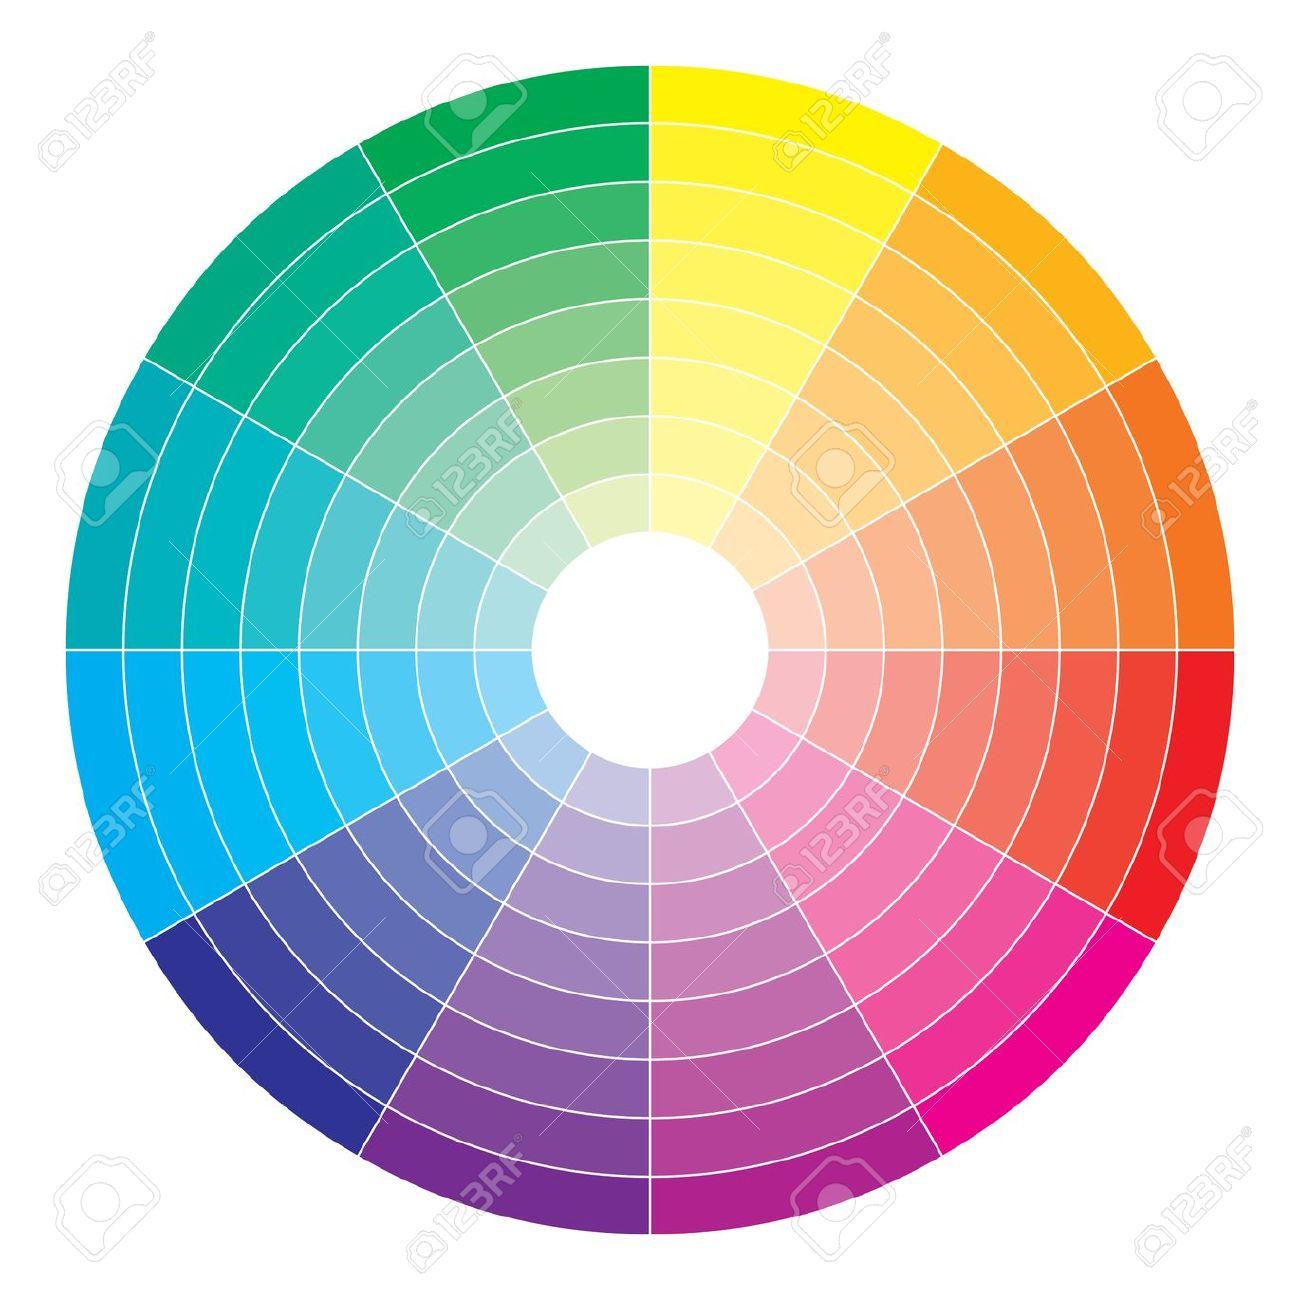 color spectrum clipart 20 free cliparts download images